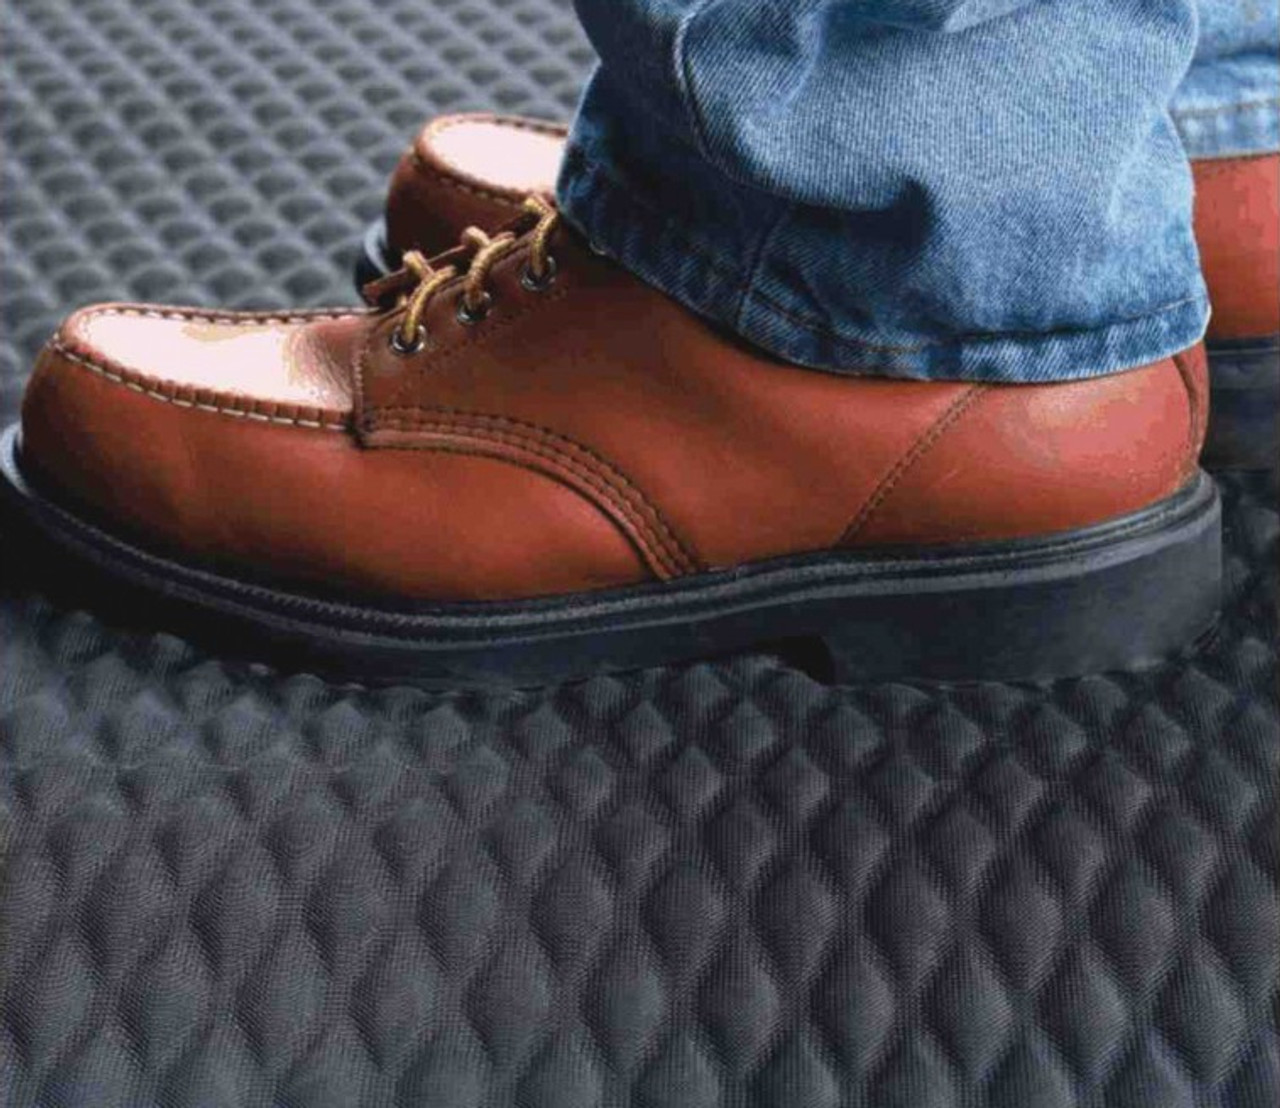 Shoes Turn Freely on Anti-Slip Diamond Pattern.